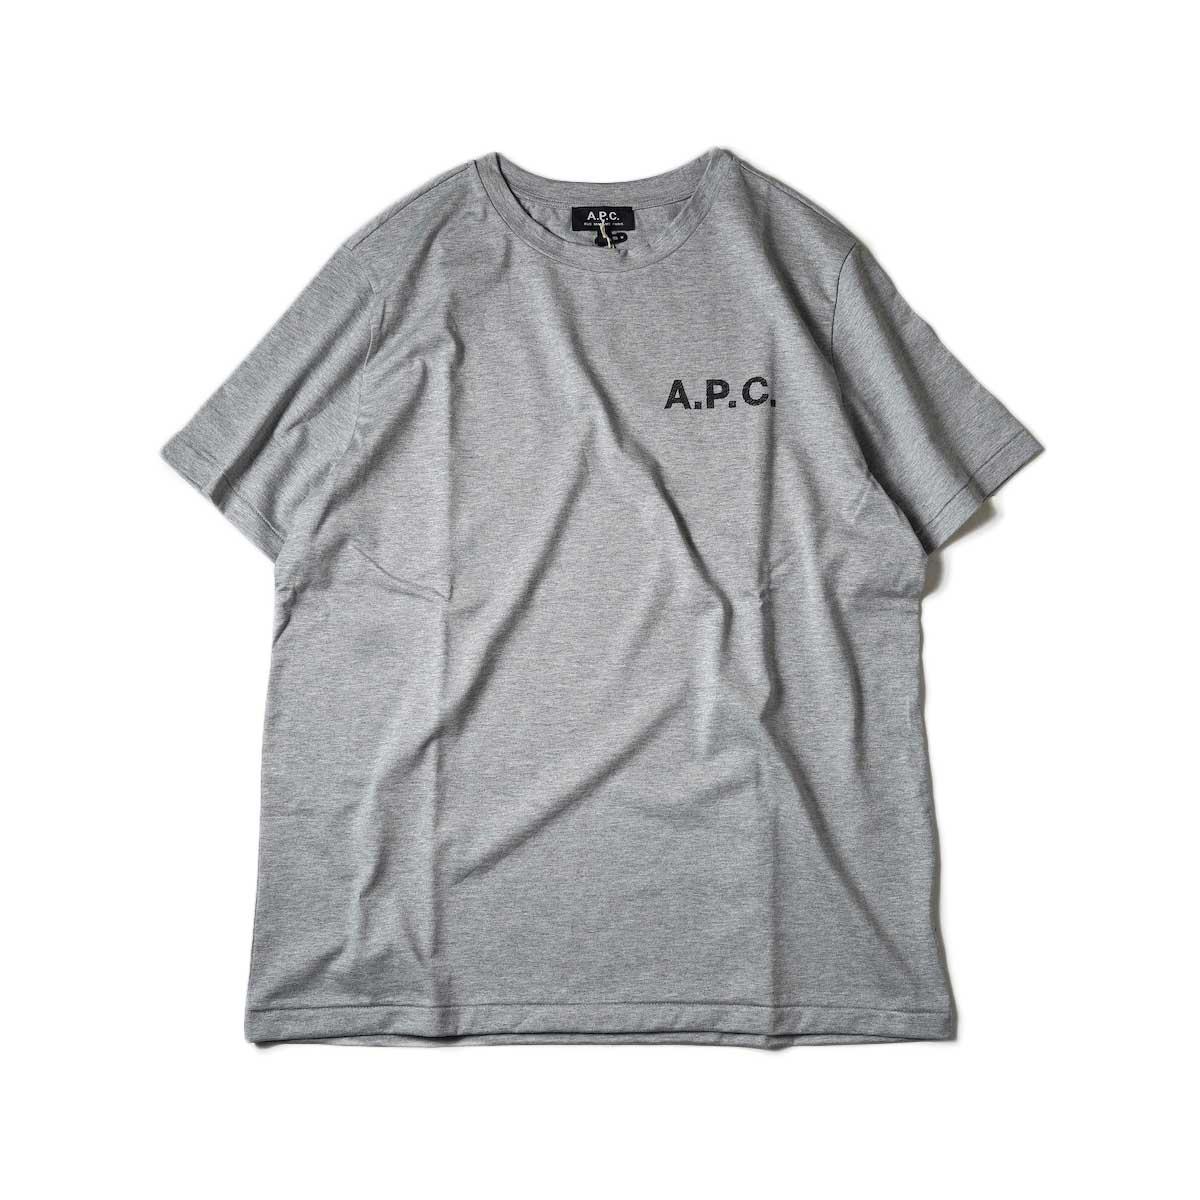 A.P.C. / Daniel Tシャツ (Gray)